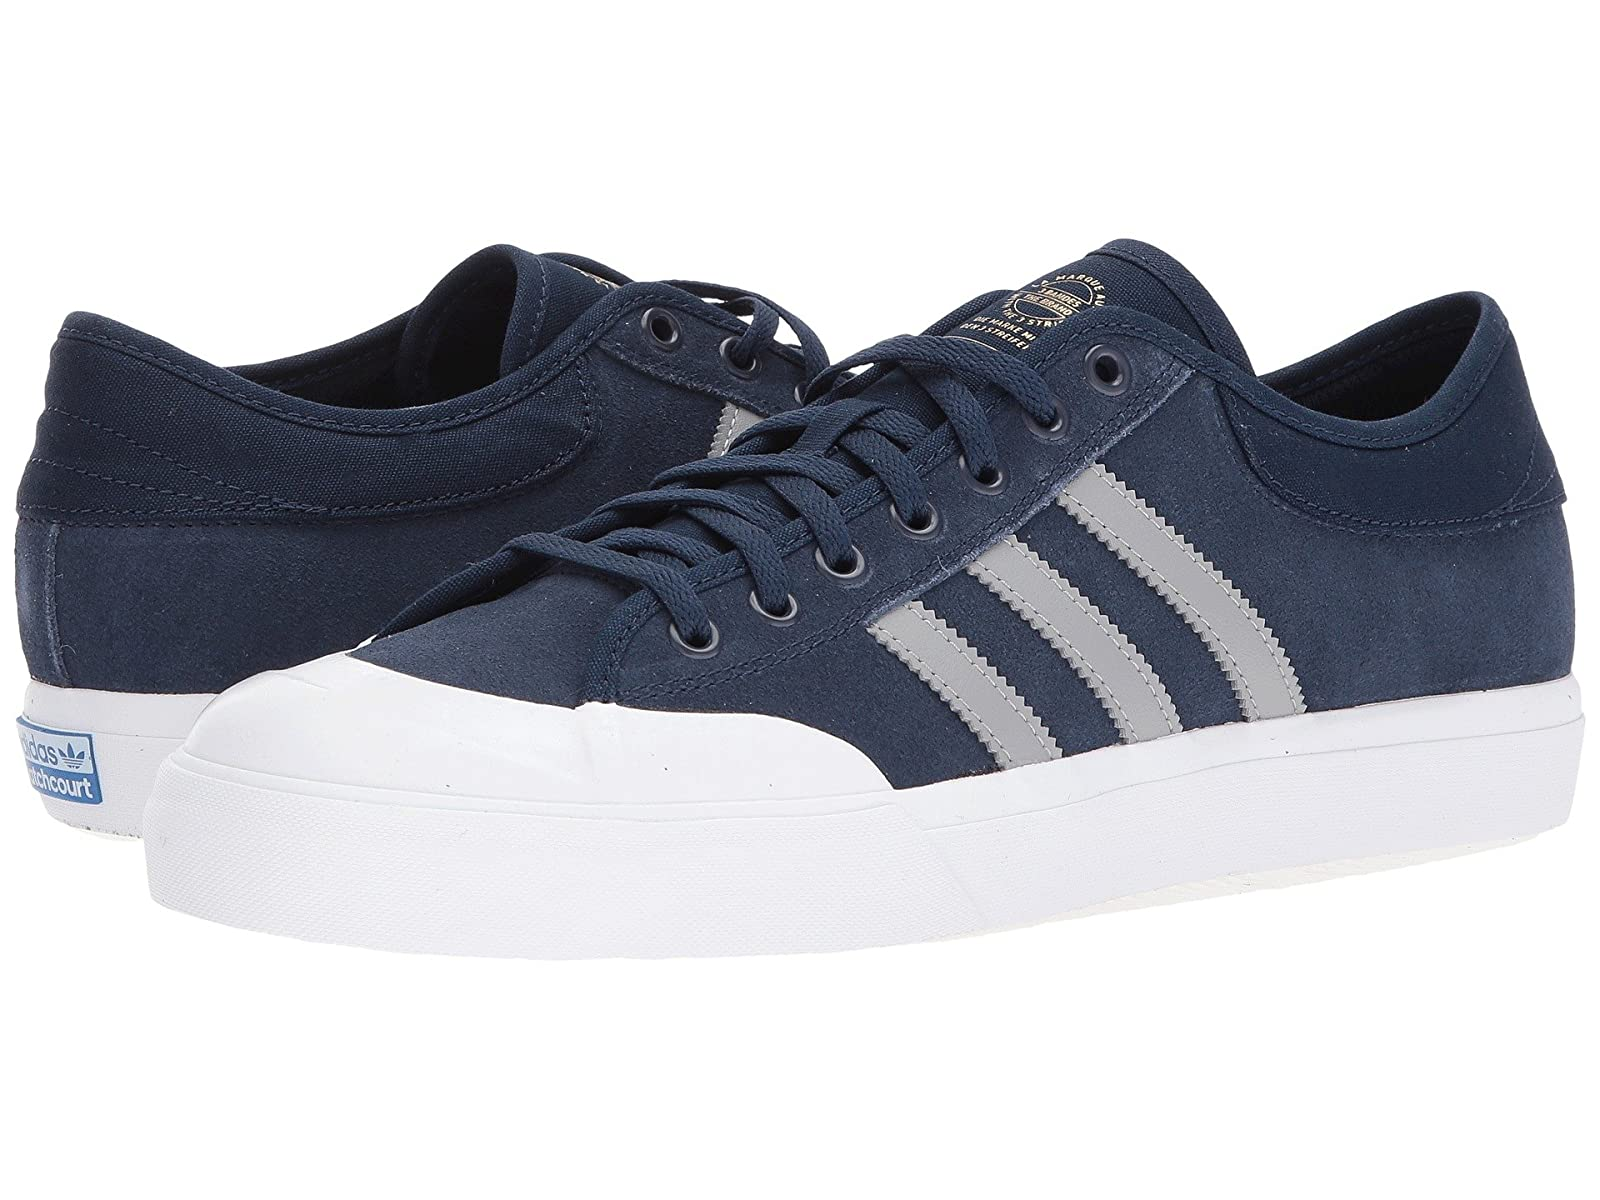 adidas Skateboarding MatchcourtStylish and characteristic shoes